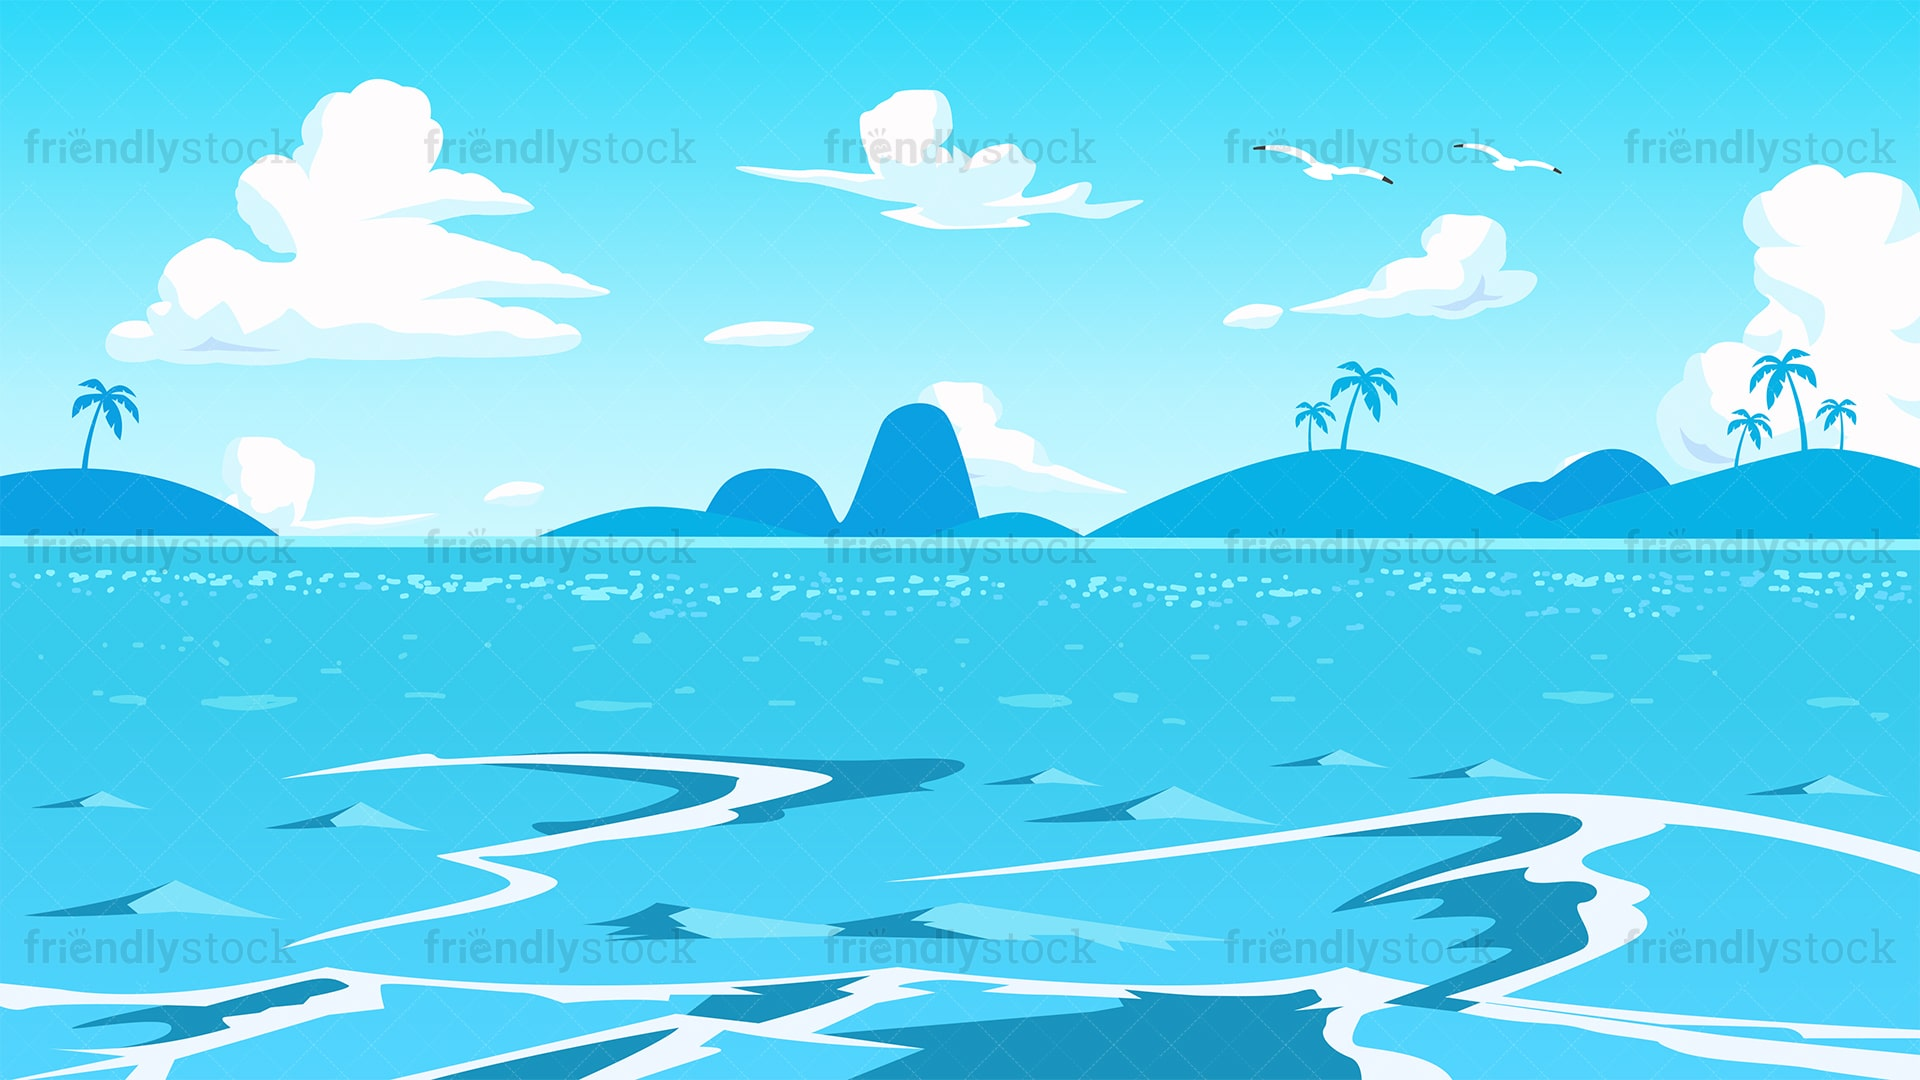 Deep Blue Sea Background Cartoon Vector Clipart Friendlystock